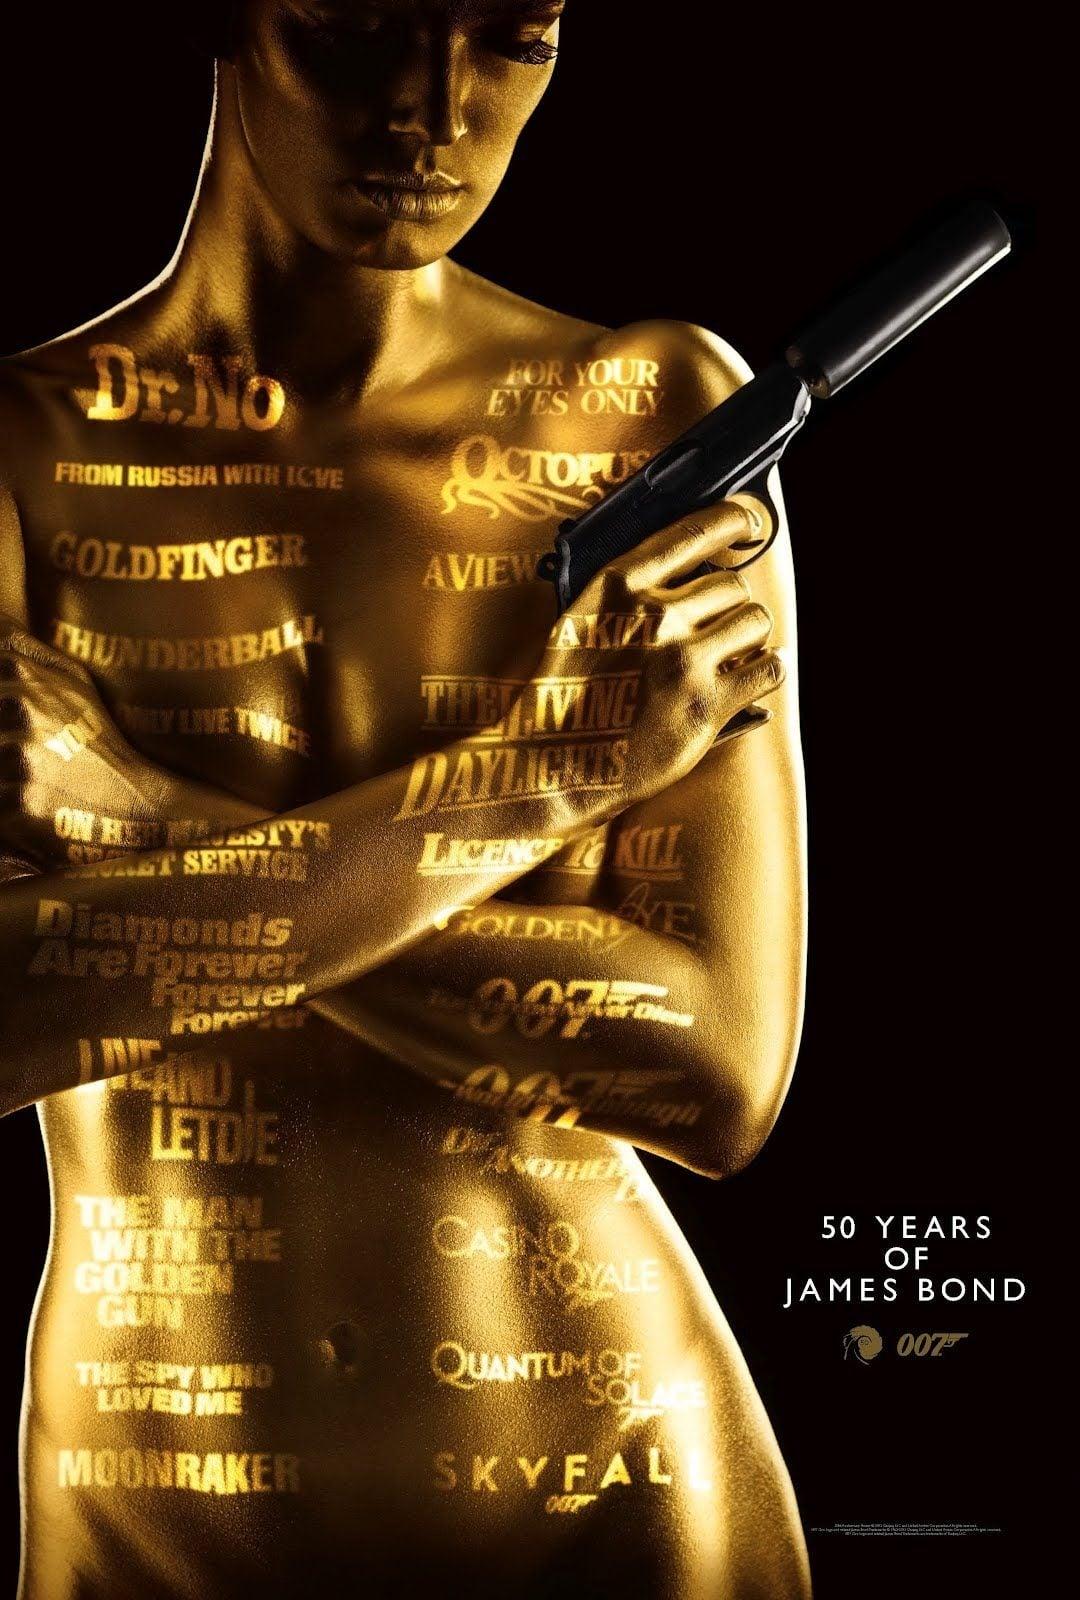 James Bond - 50th Anniversary: Bonus Features (2012)